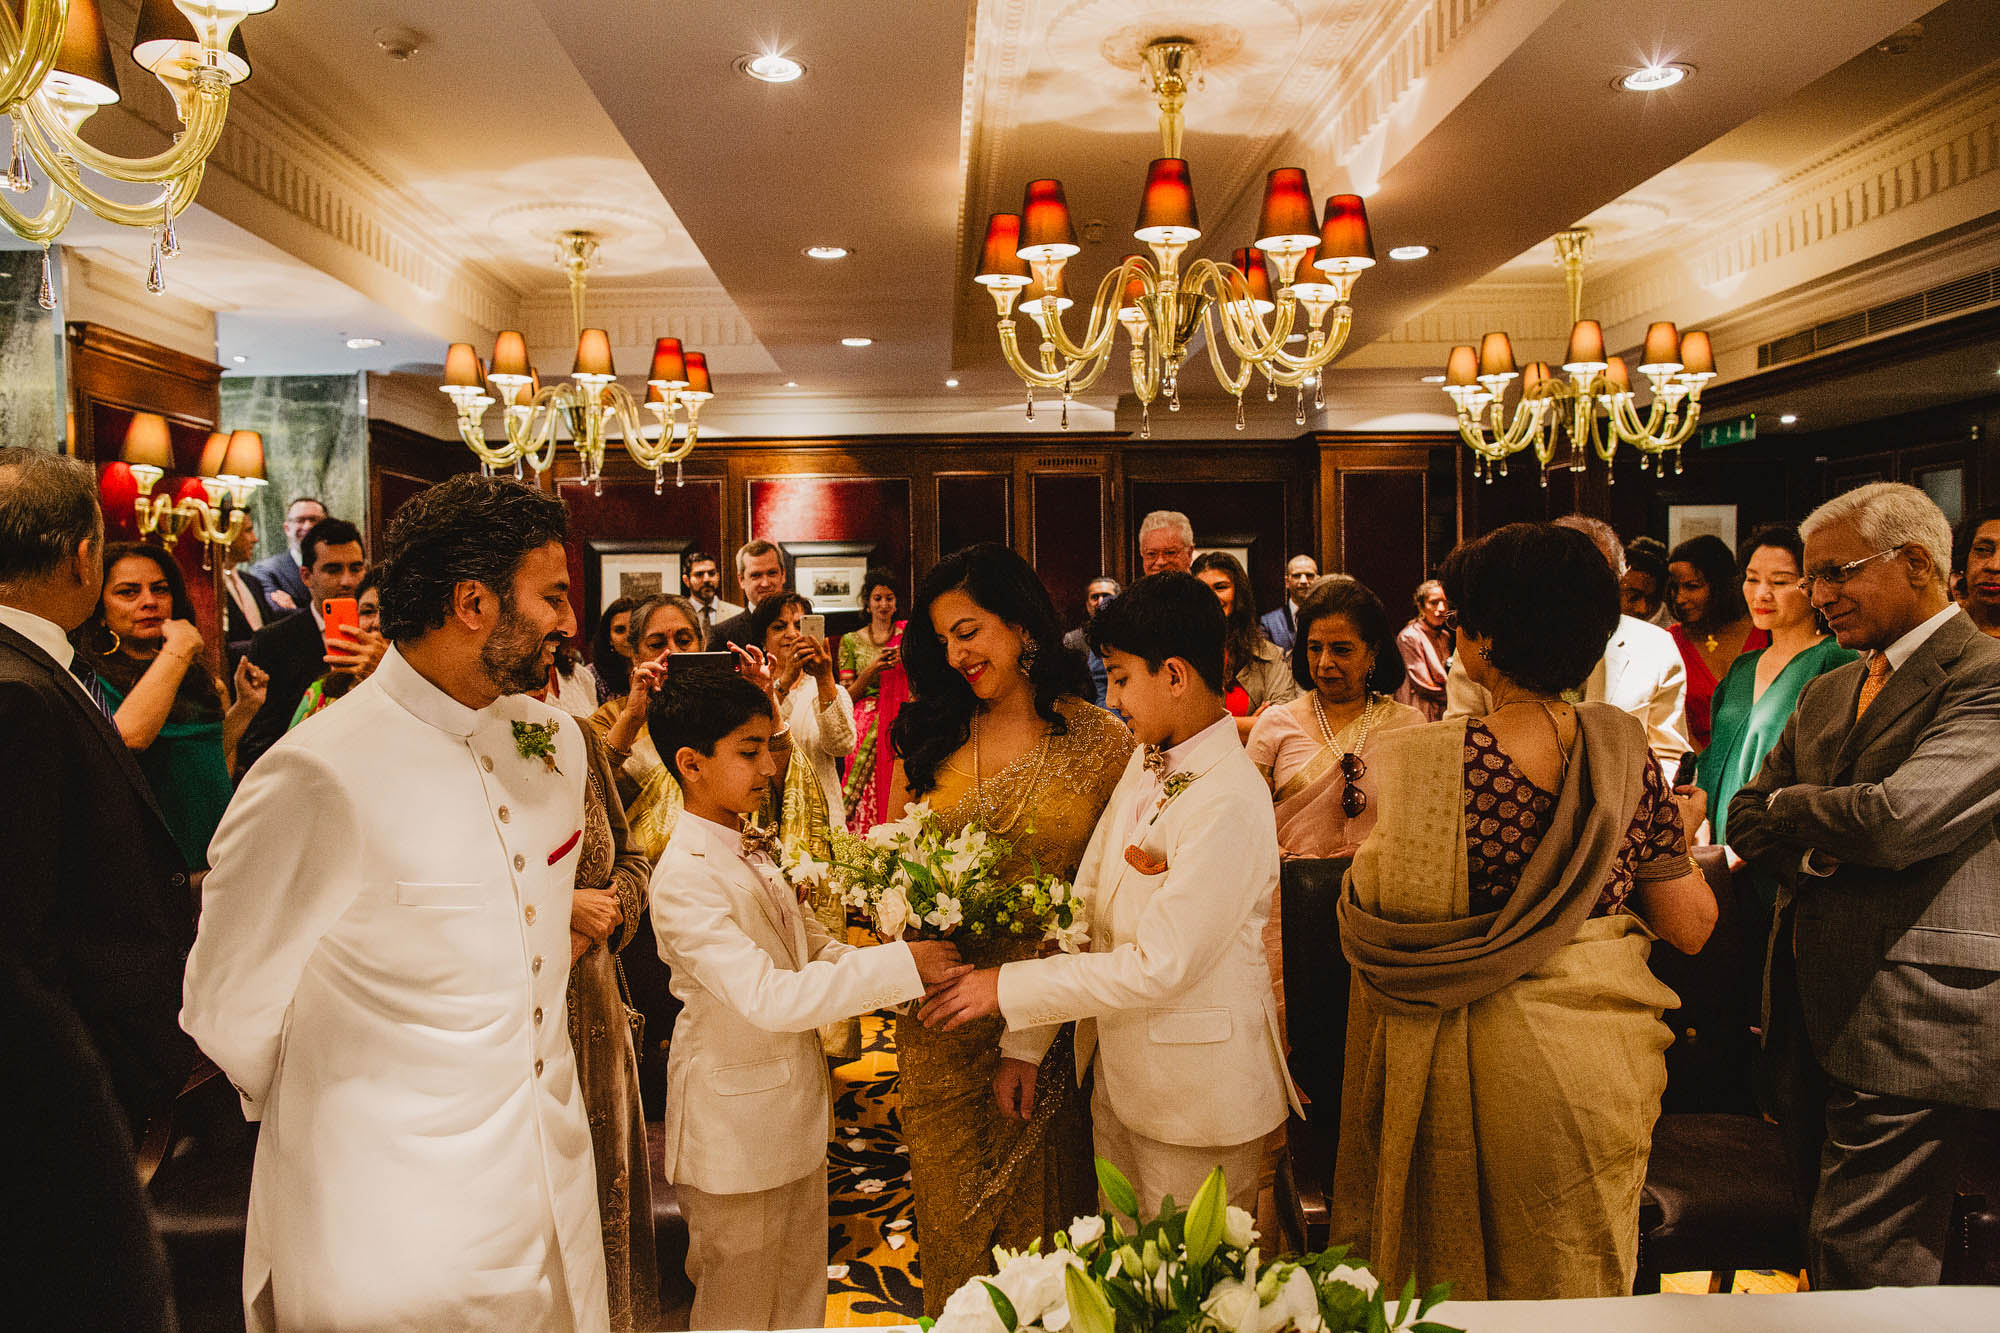 Goring hotel London wedding 15